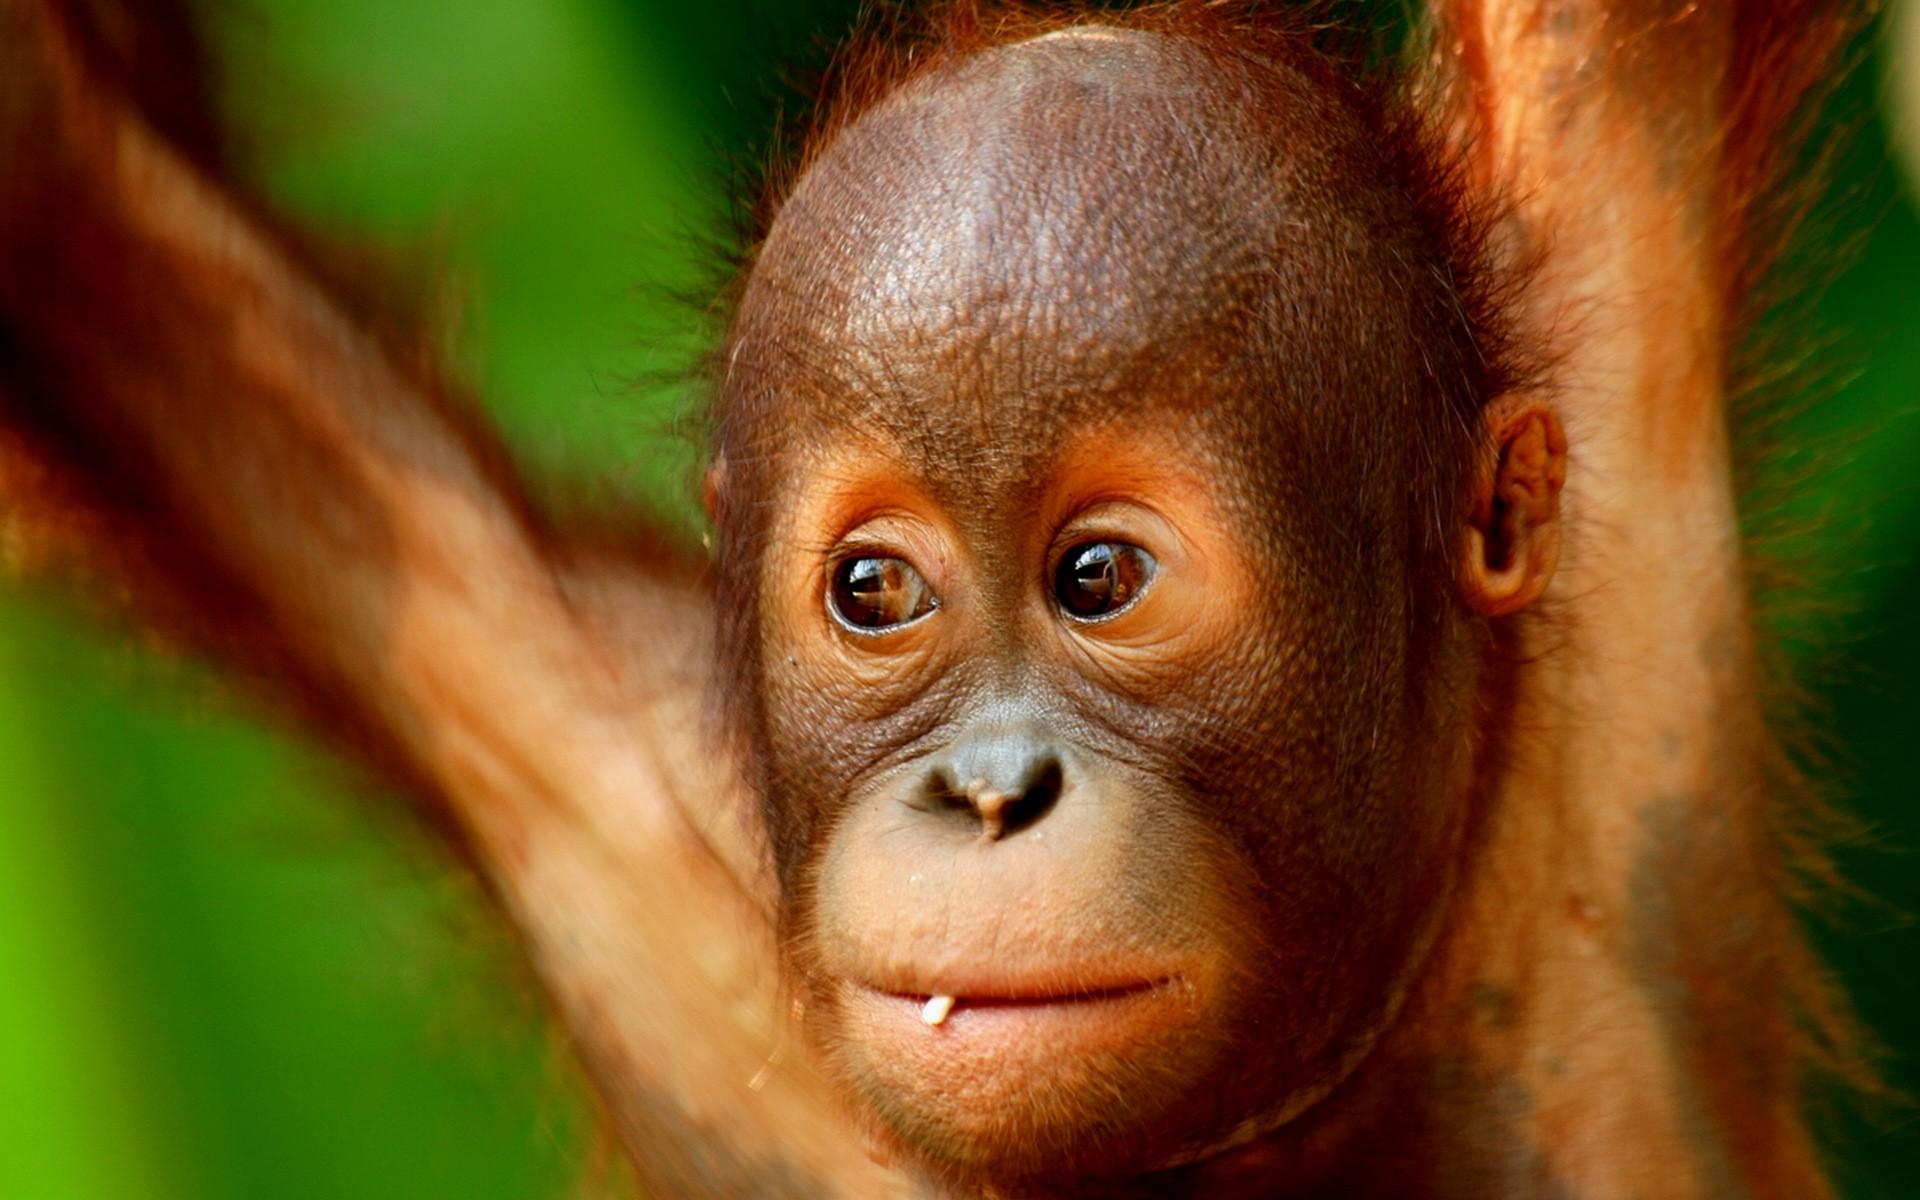 cool monkey wallpaper,orangutan,vertebrate,mammal,primate,skin